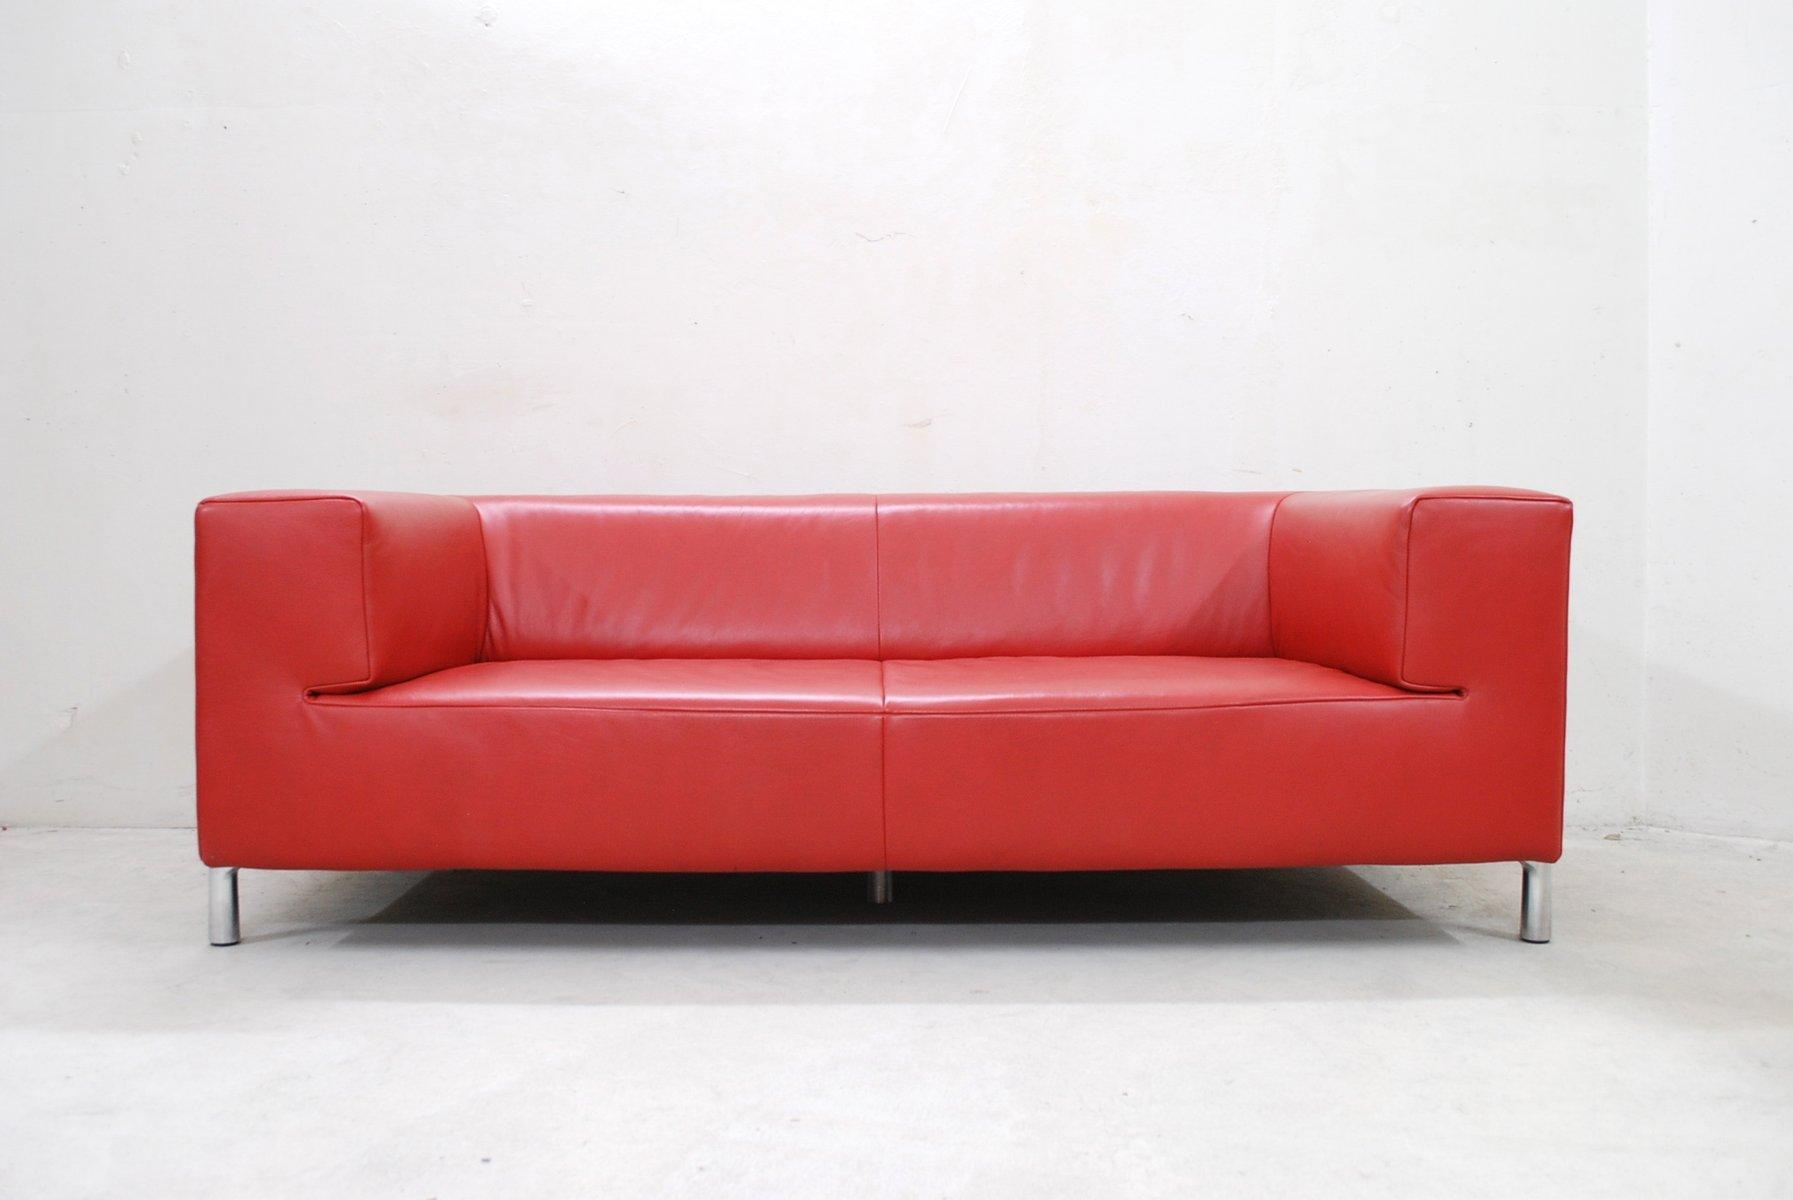 Divano Genesis vintage in pelle rossa di Koinor